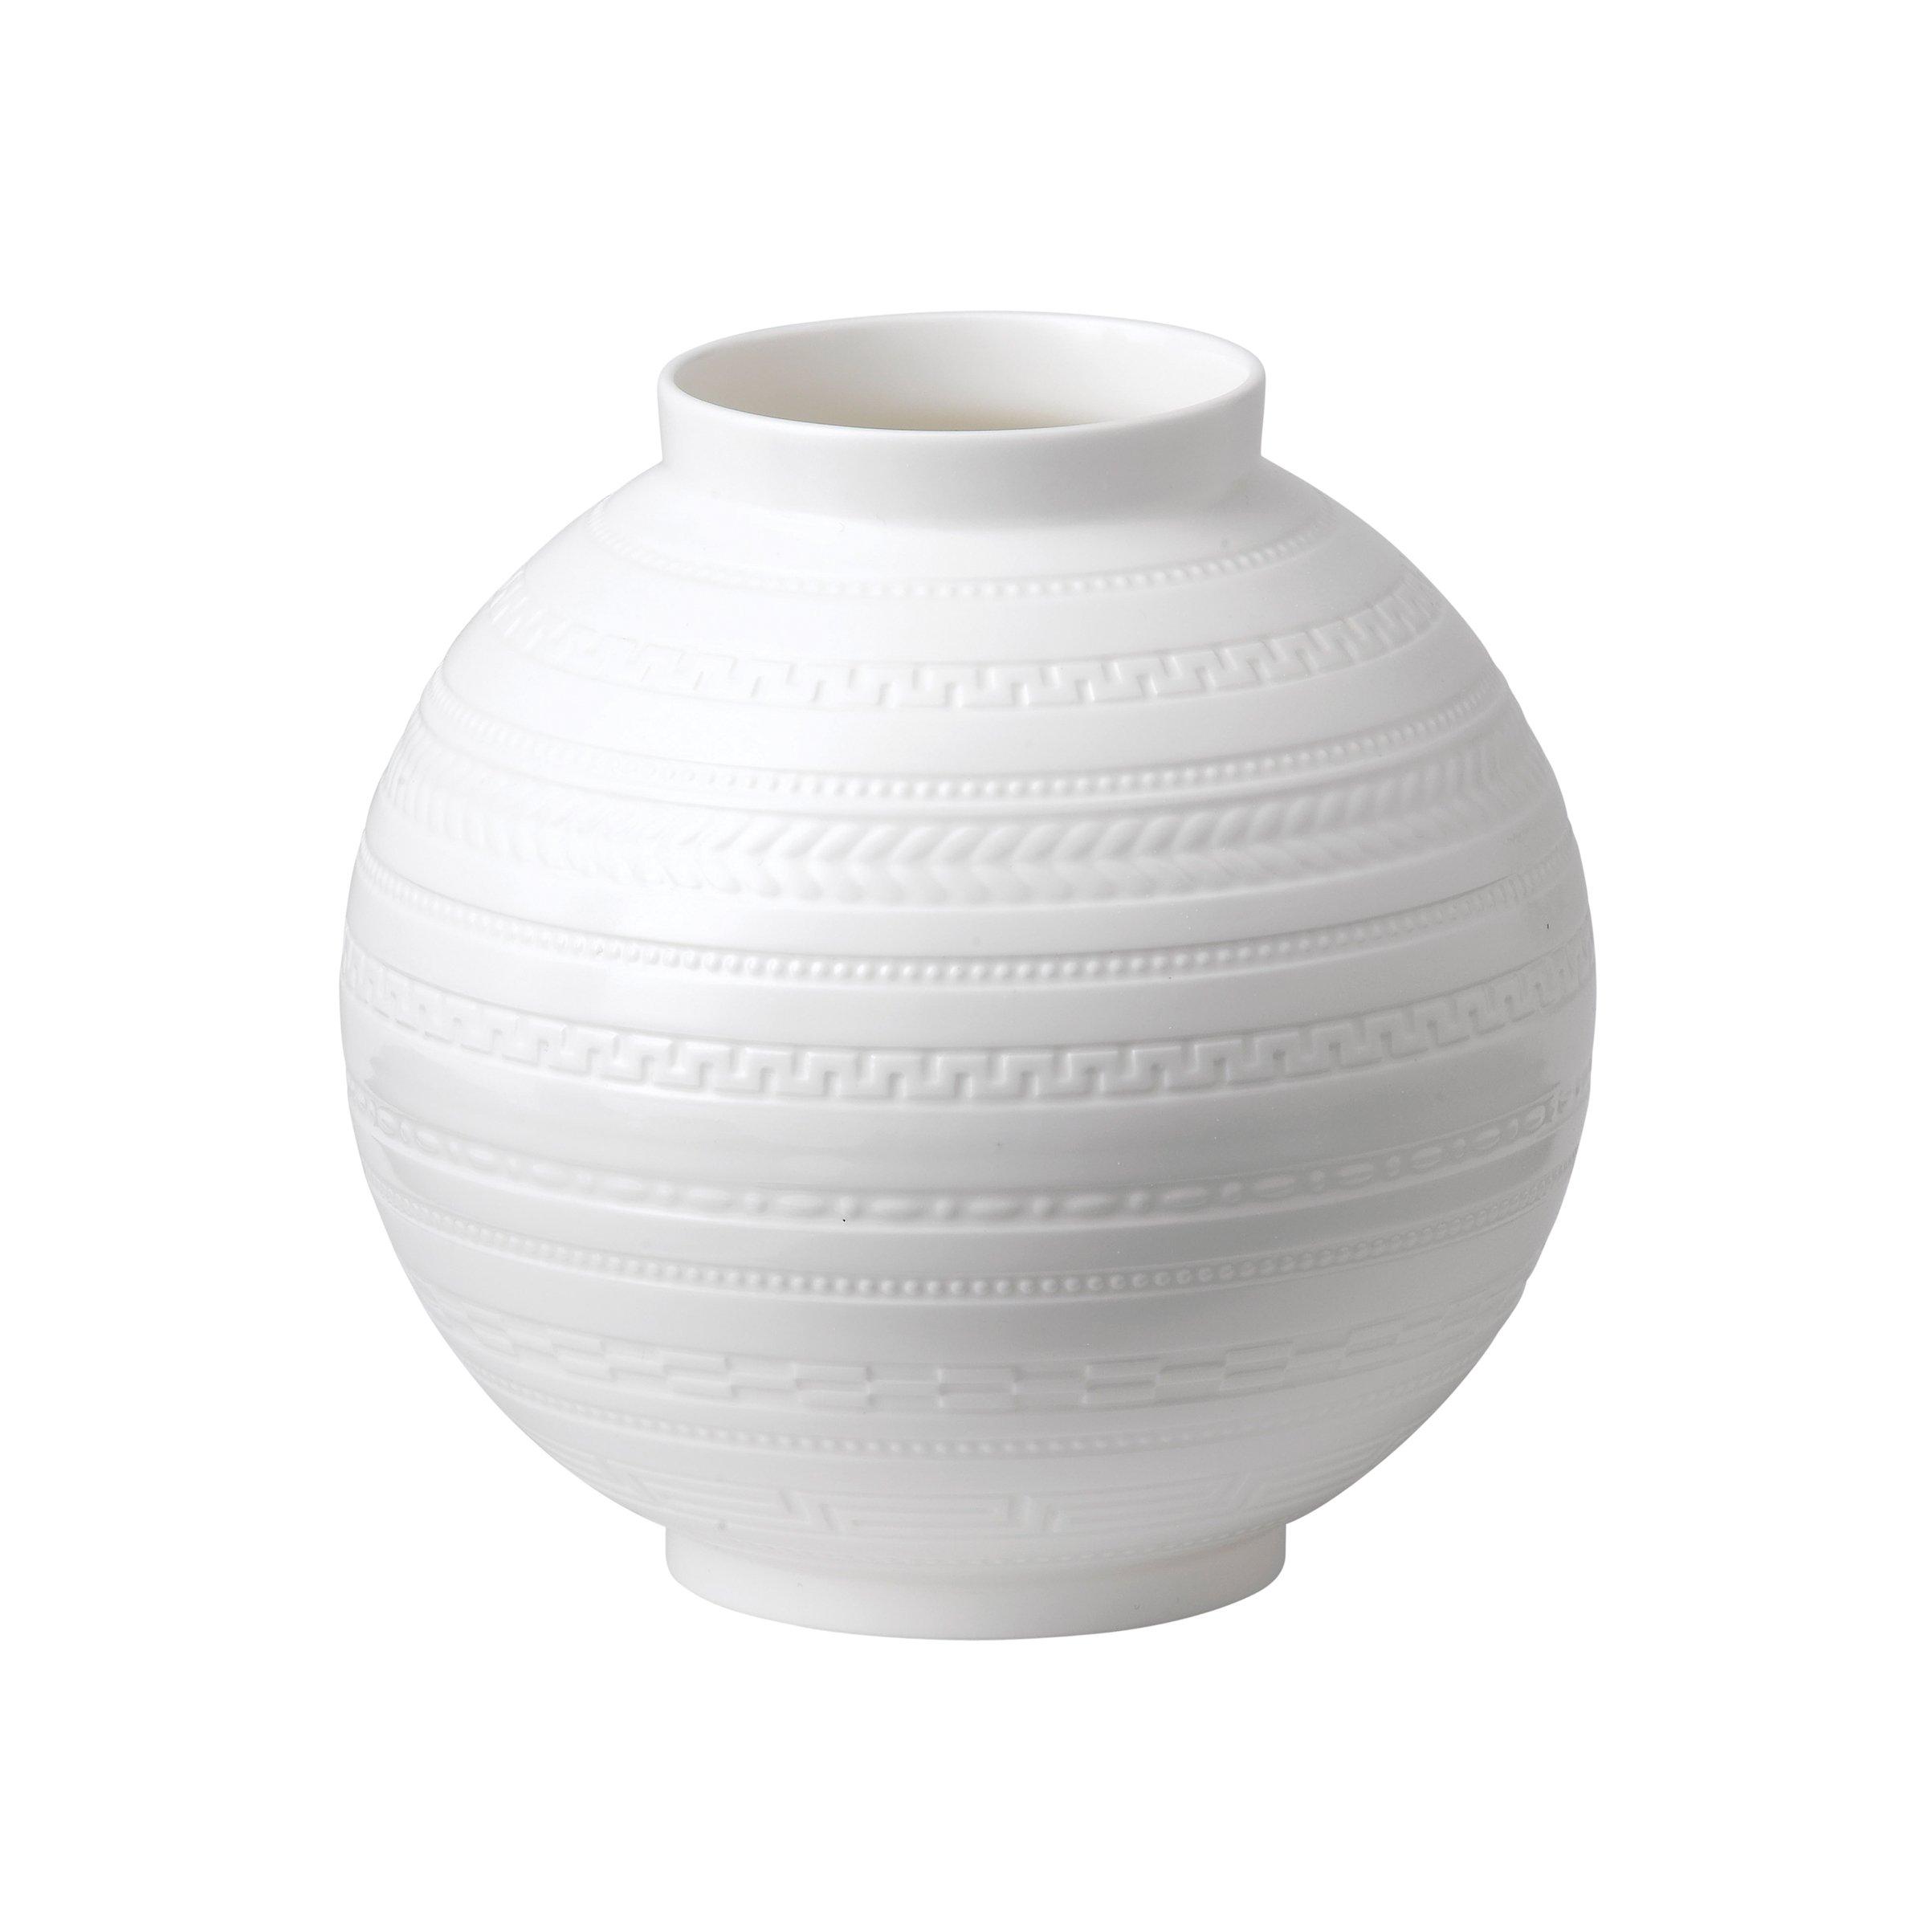 wedgwood intaglio giftware white vase cm  wedgwood® australia - wedgwood intaglio giftware white vase cm